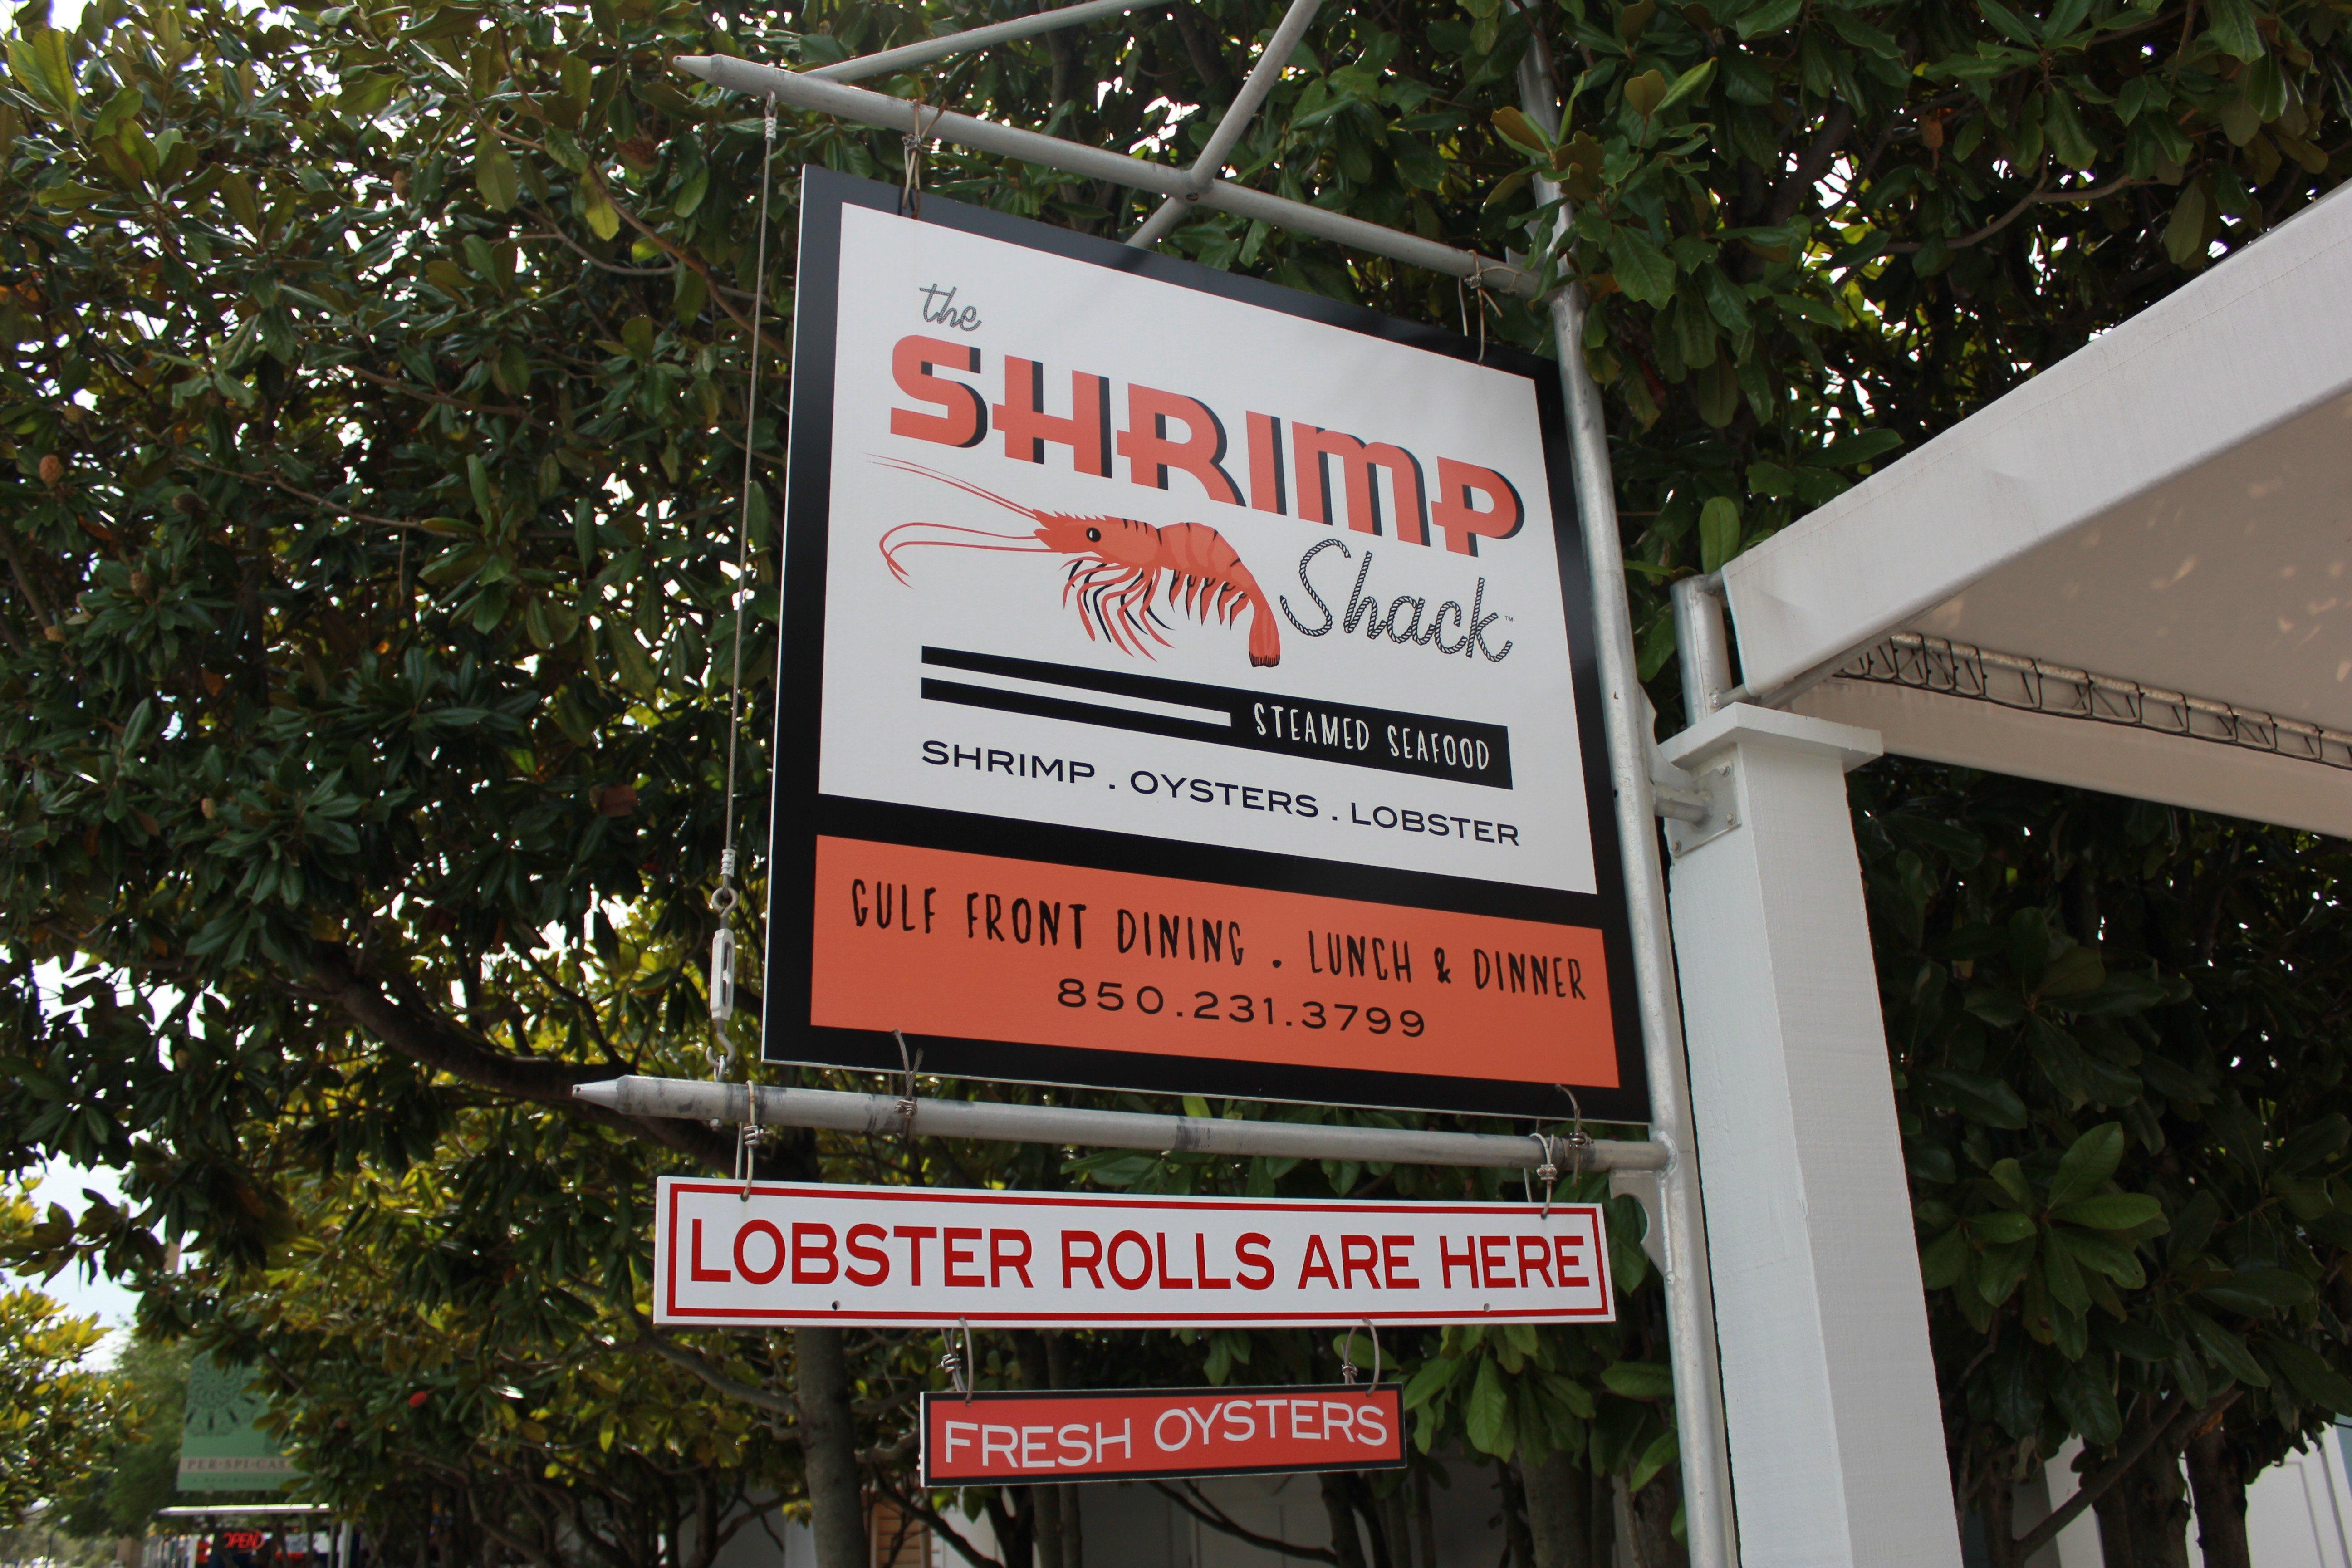 Seaside The Shrimp Shack 30a food and wine